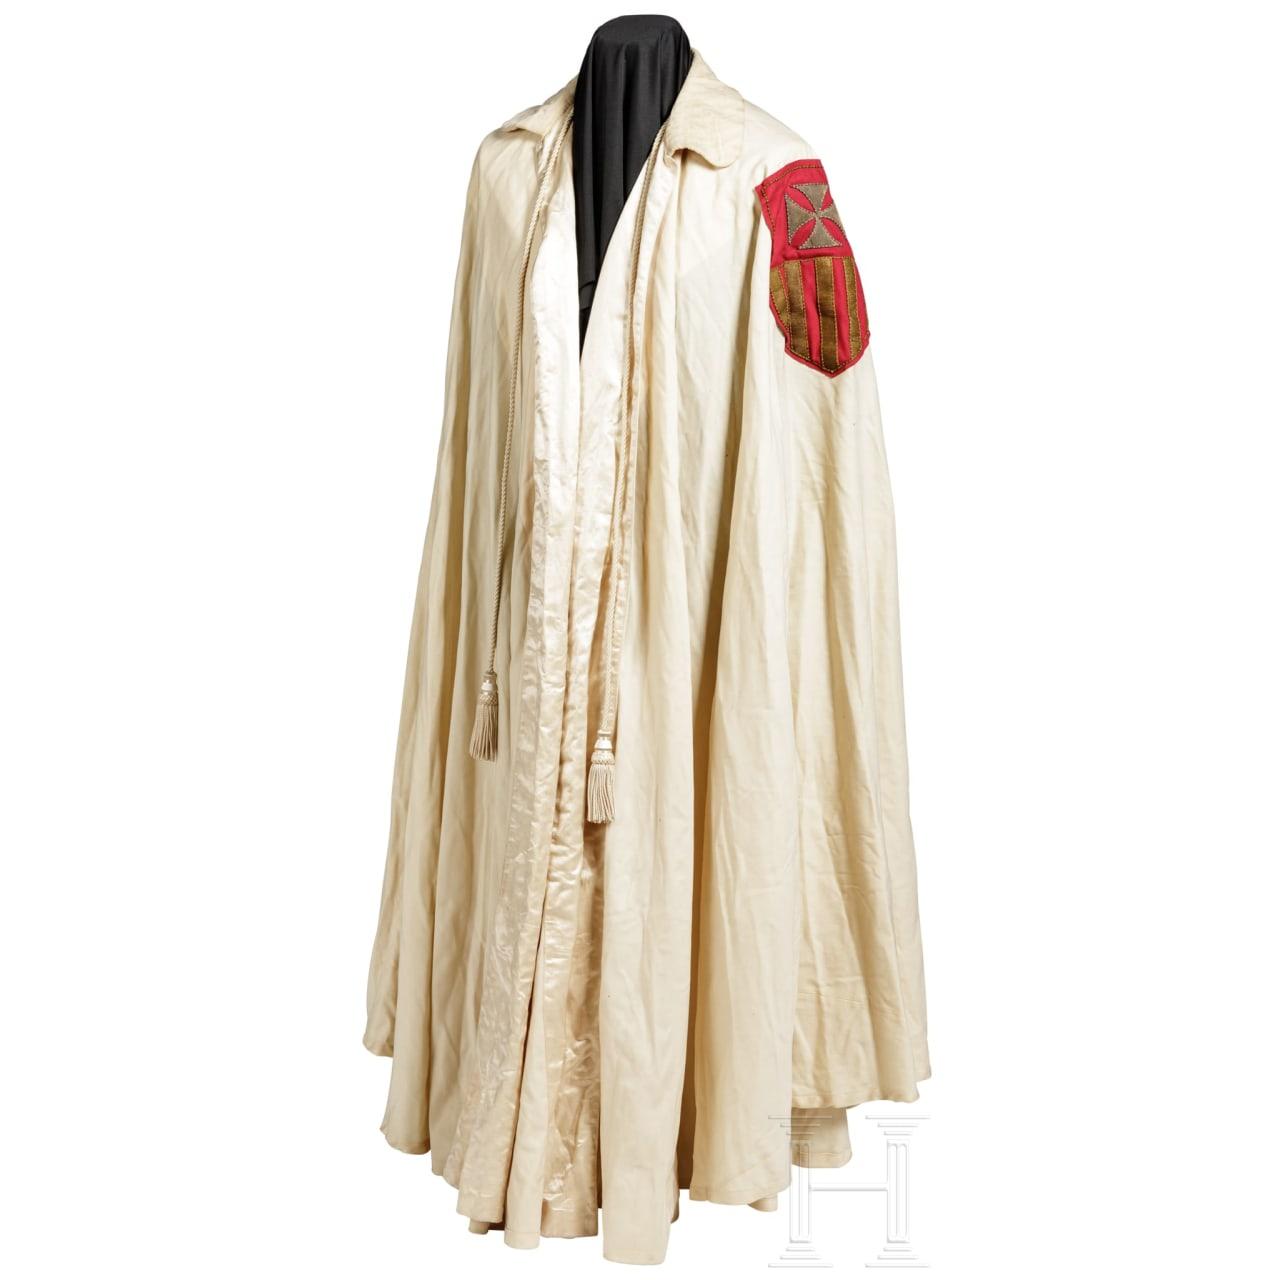 Umhang eines Ritterordens, Vatikan, 20. Jhdt.